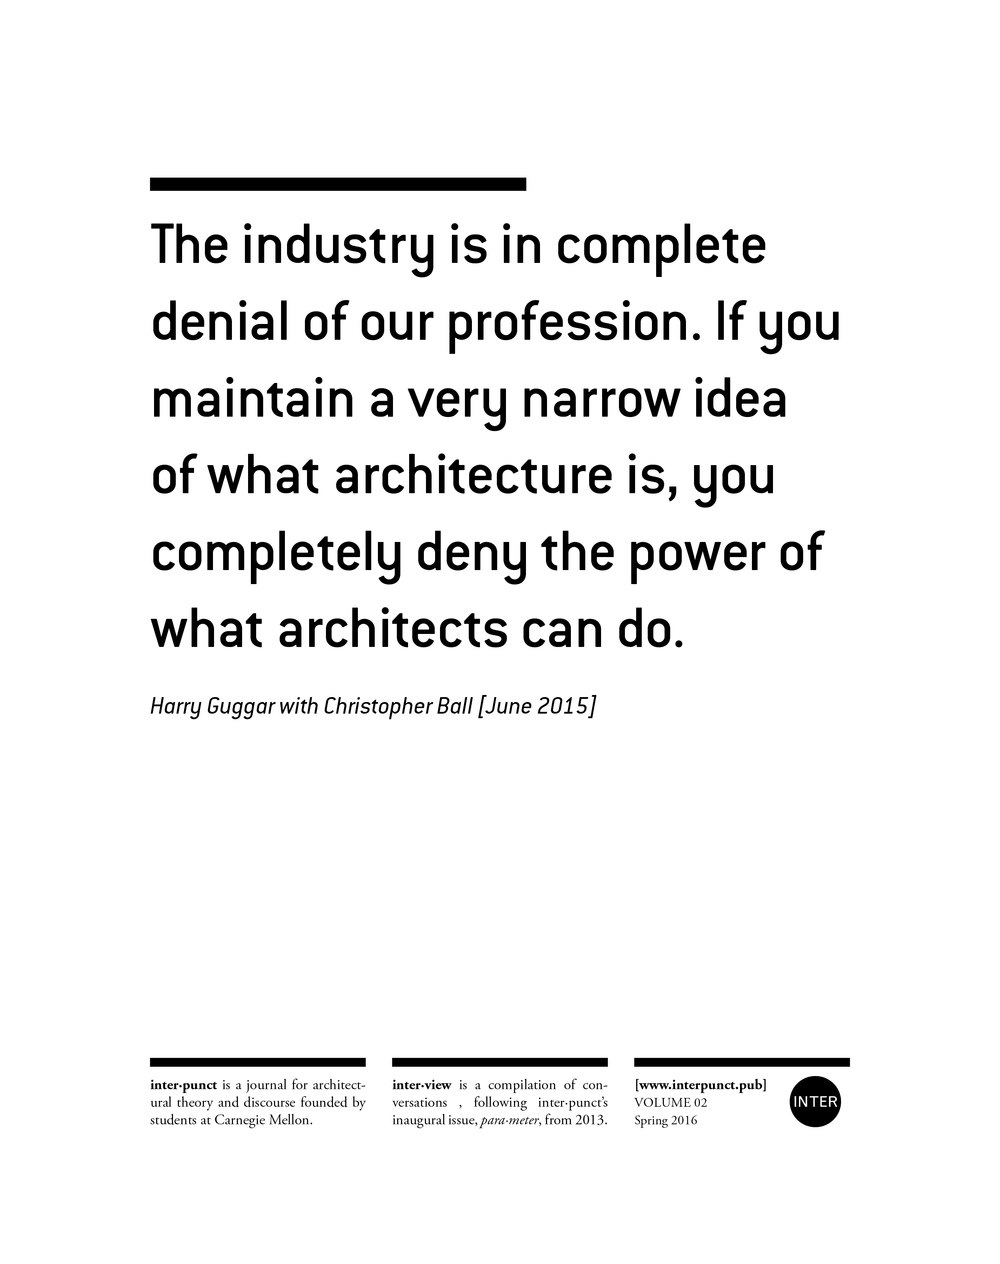 Interpunct_Posters4.jpg